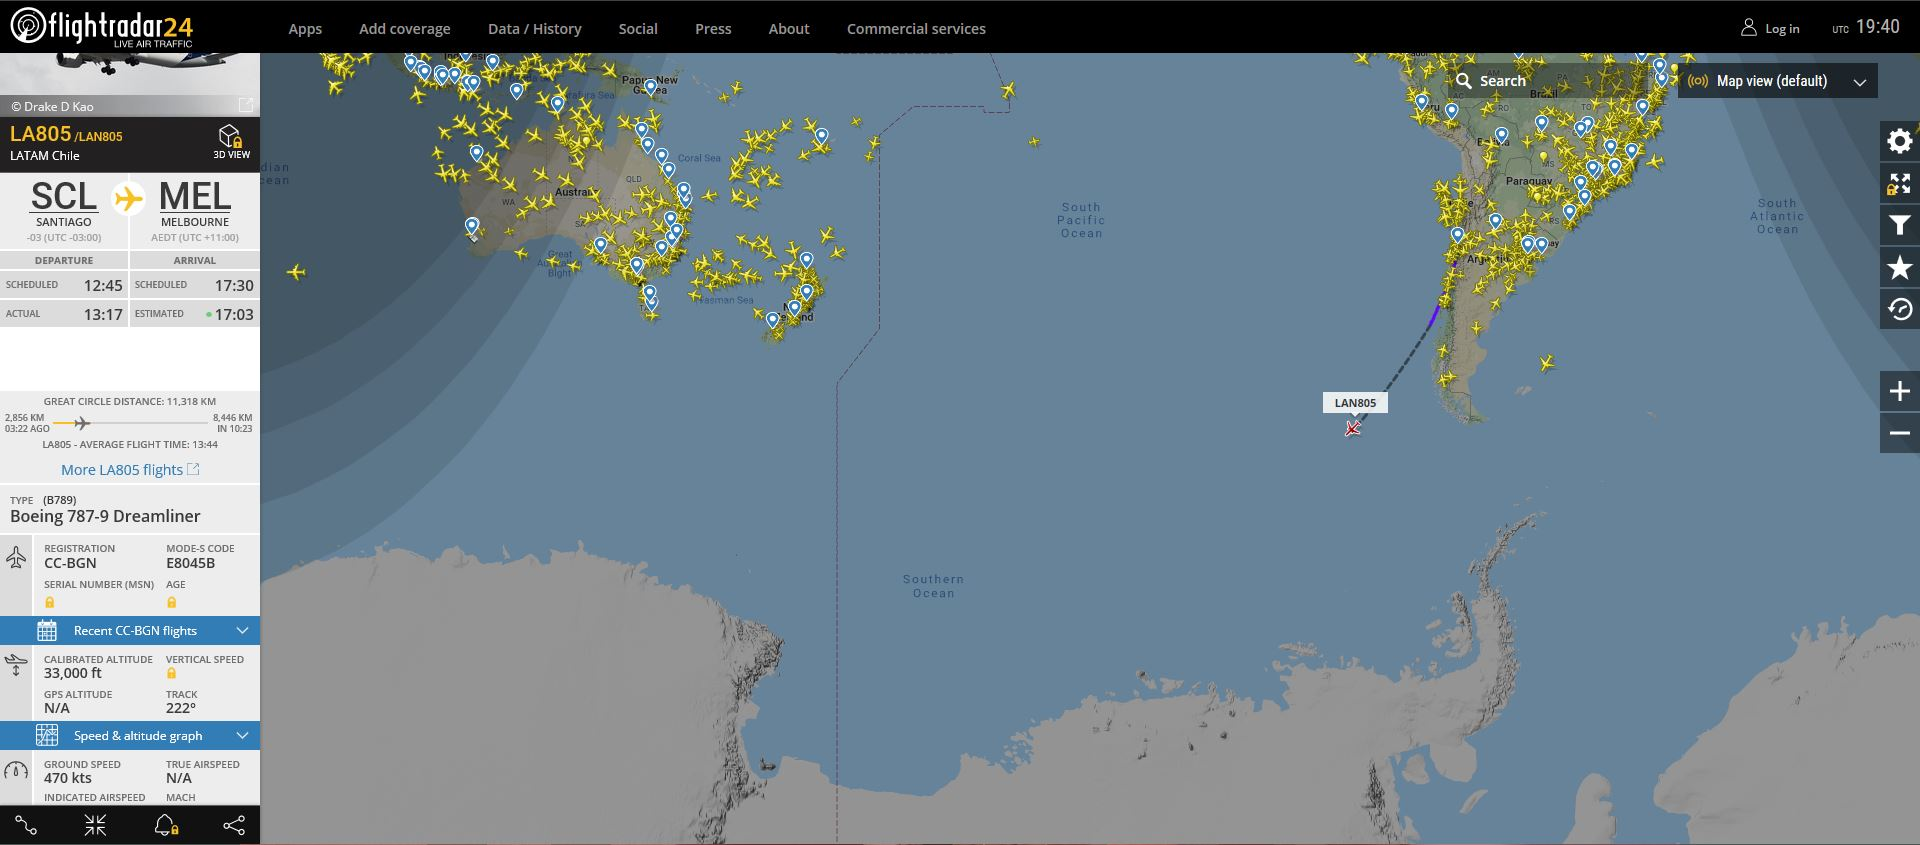 radarvirtuel.com/Flightradar24.com : tous les avions en vol en direct sur une carte - Page 4 Tsge_282